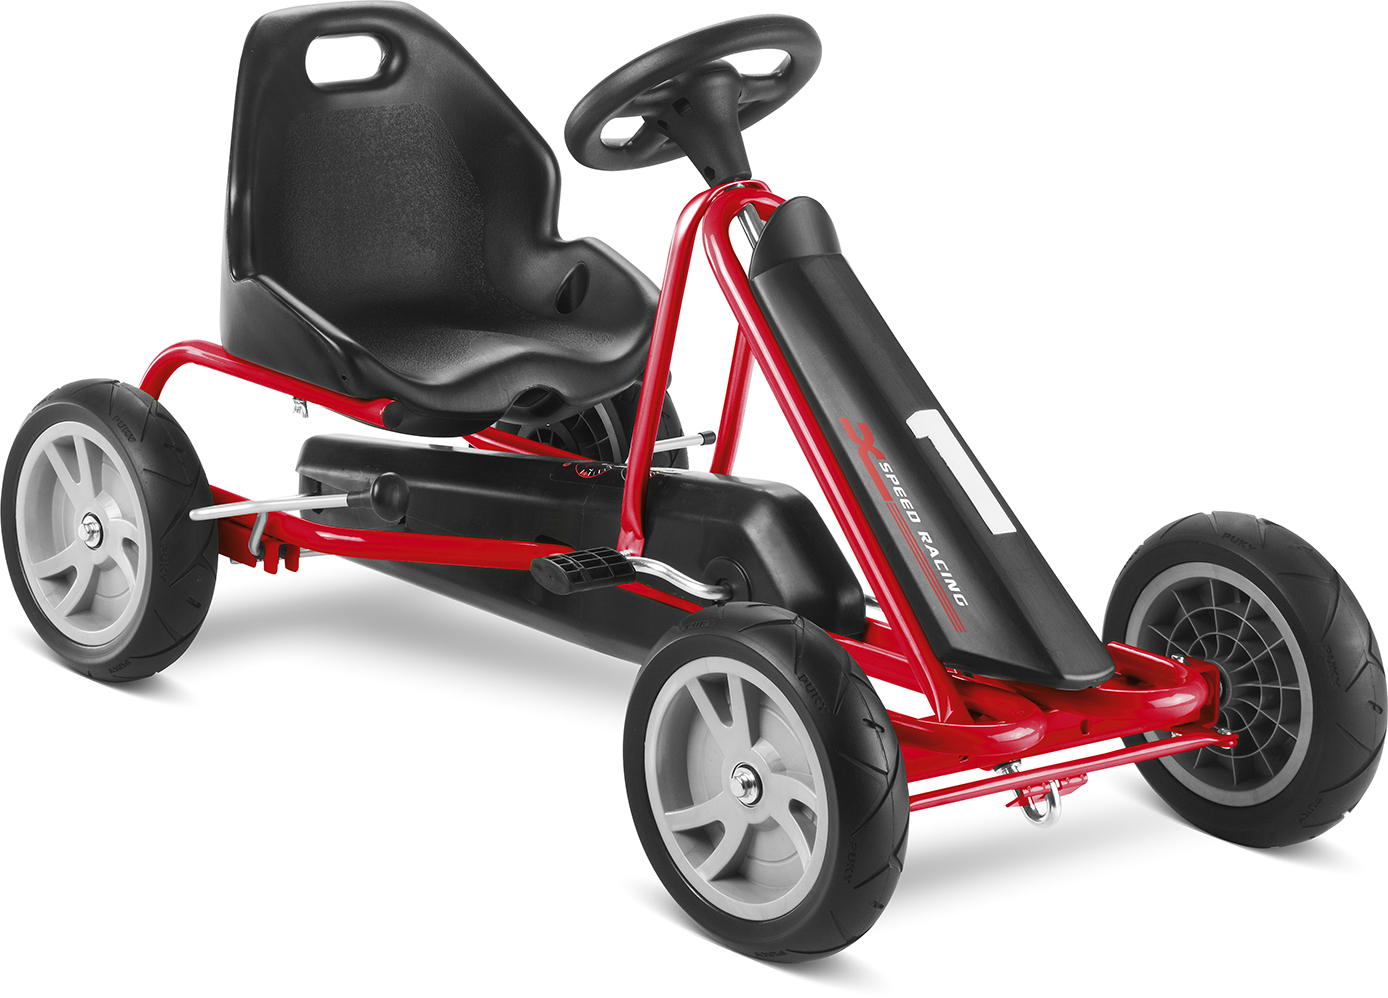 Puky Go-Cart Go Kart F 20 Kindergokart rot 3323 Gokart | eBay